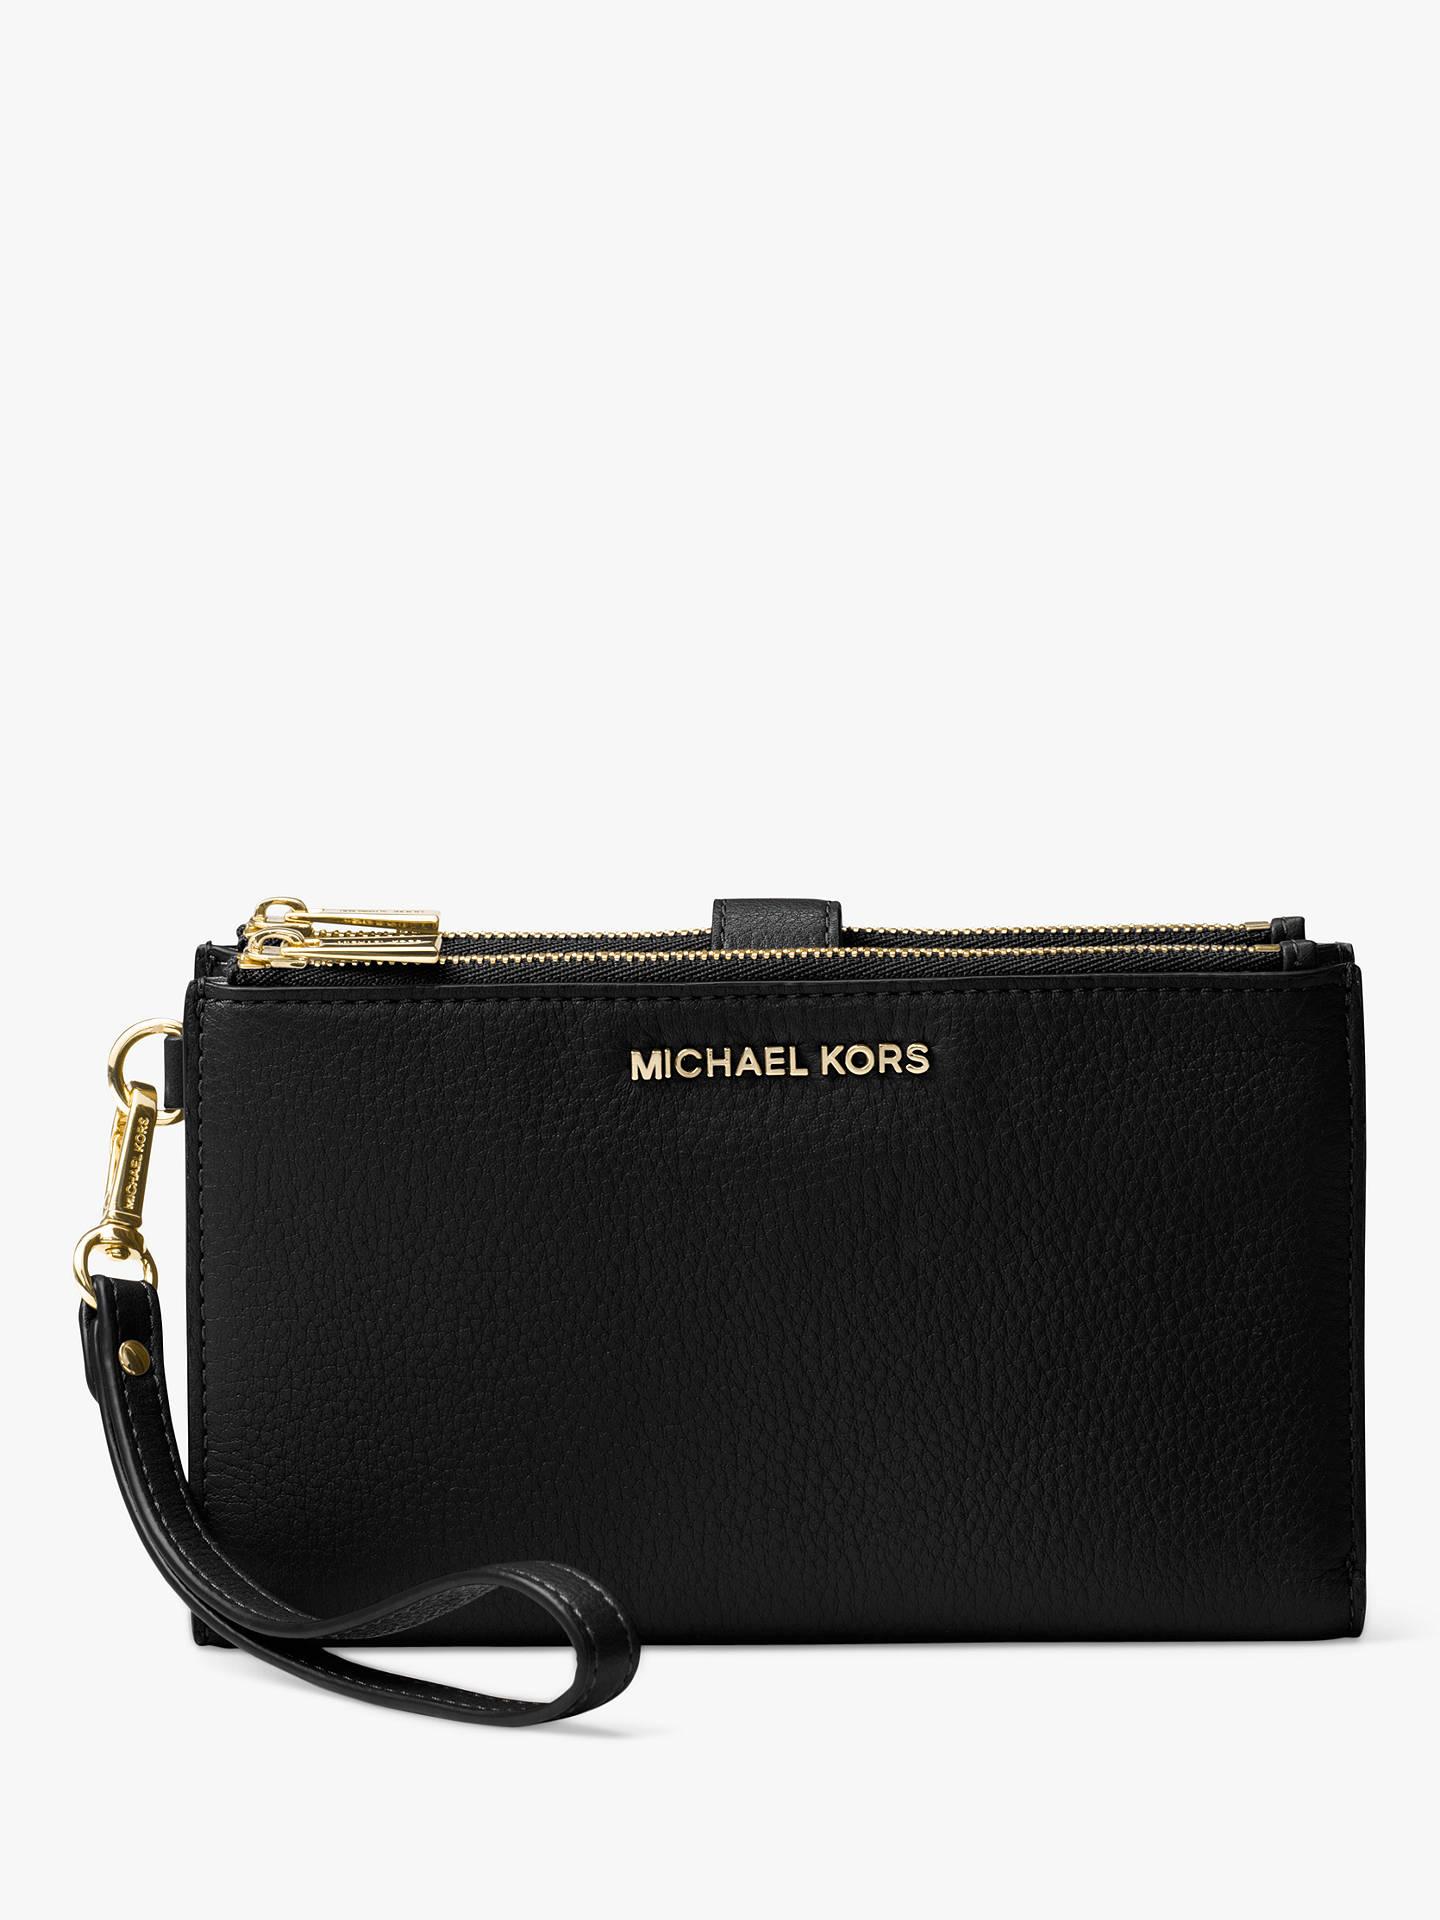 b832b7fa455ebe Buy MICHAEL Michael Kors Pouches & Clutches Leather Wristlet Purse, Black  Online at johnlewis.